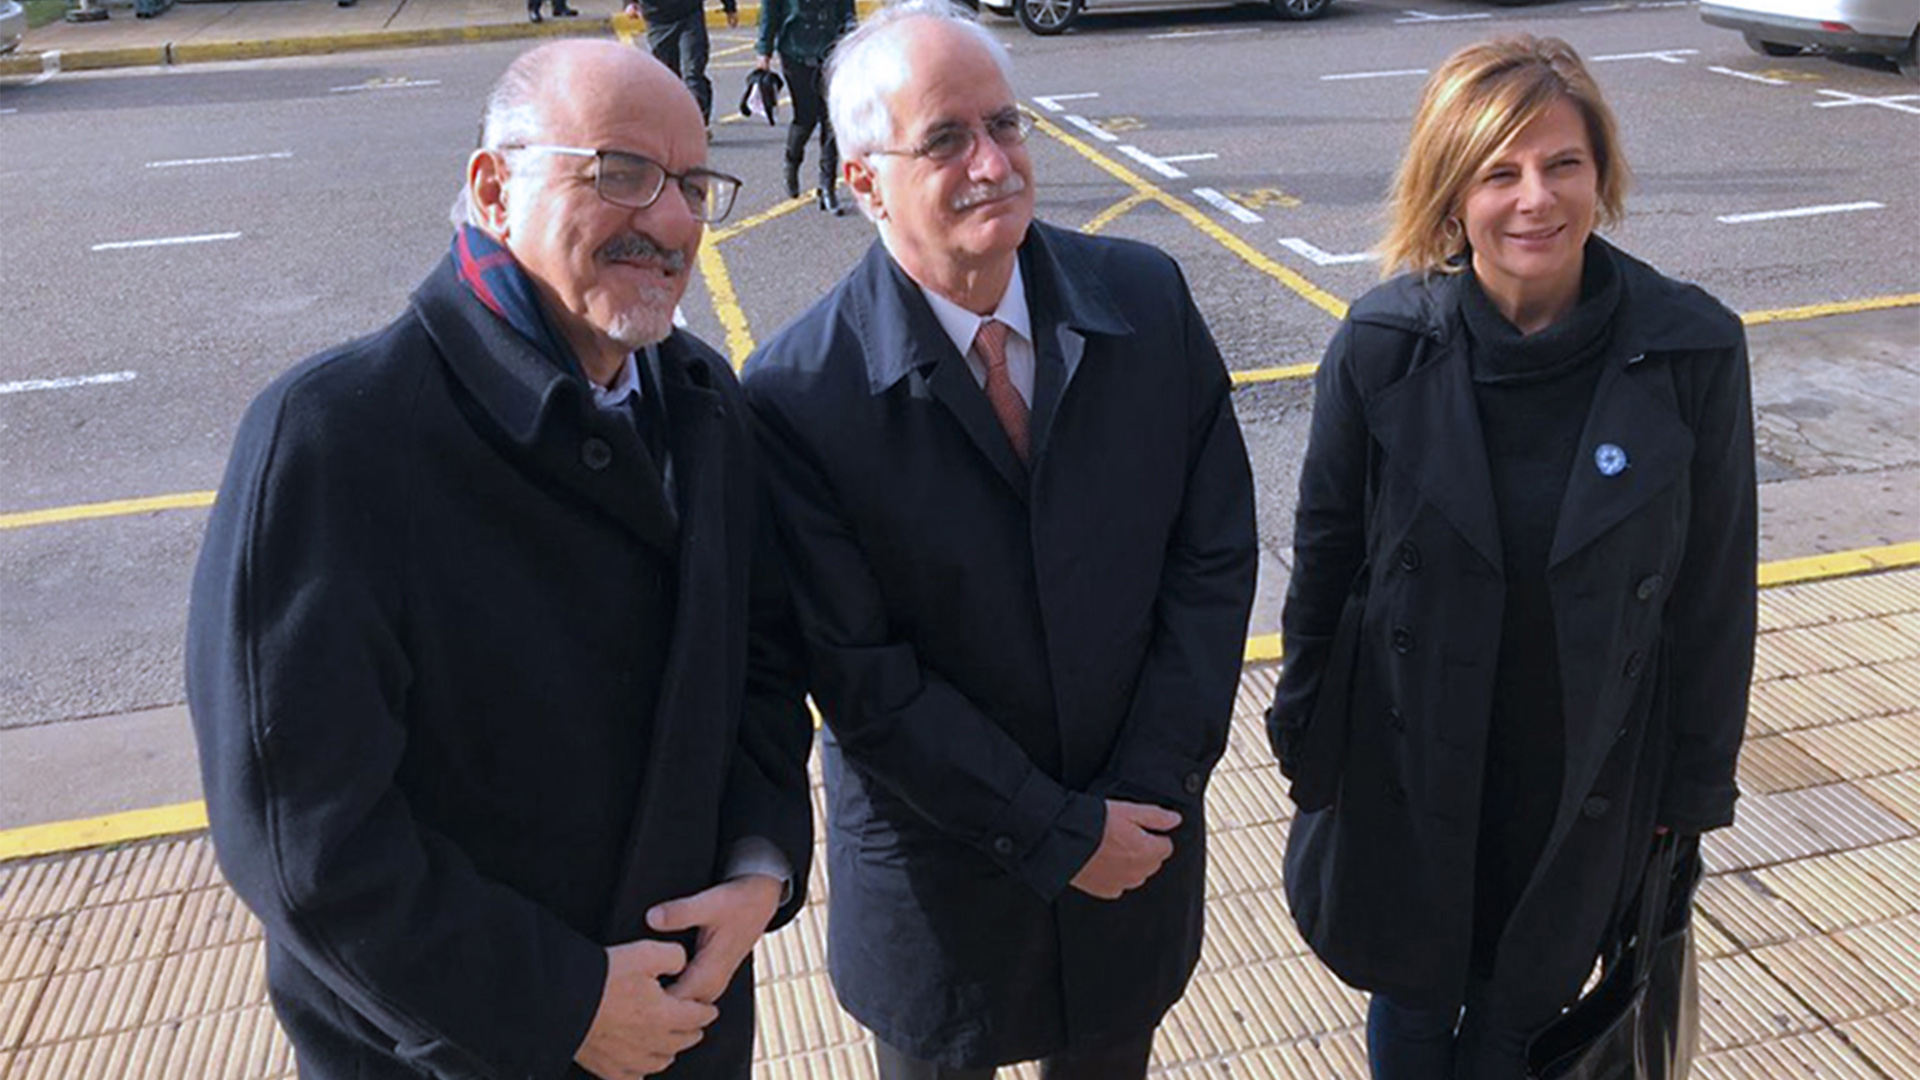 Carlos Tomada, Jorge Taiana y la diputada Florencia Saintout